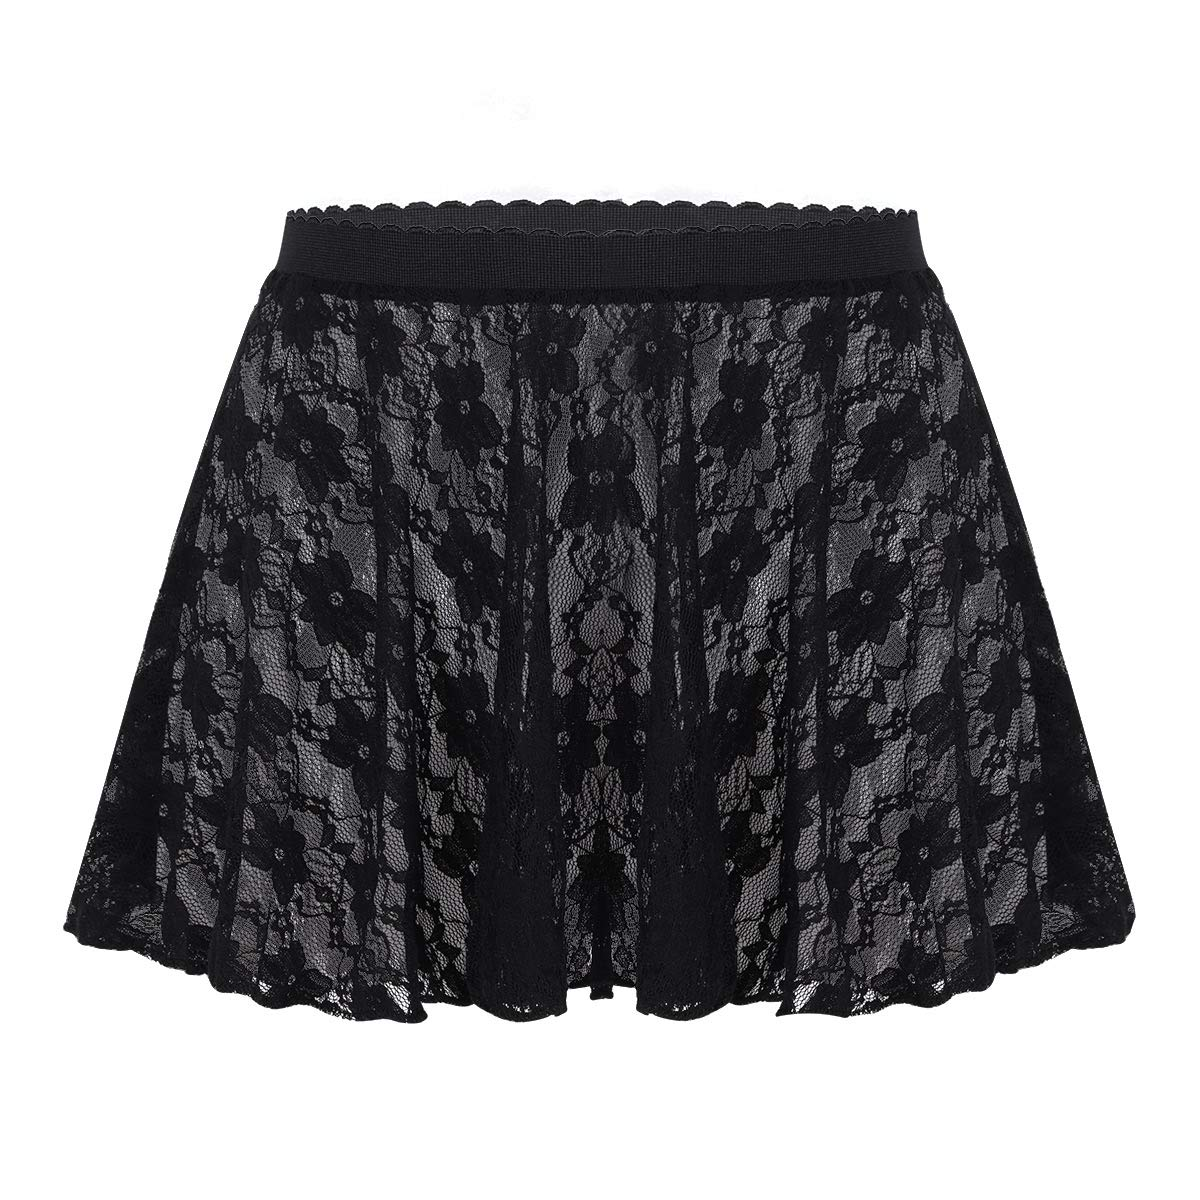 dPois Kids Girls Basic Dance Active Dress Wrap Skirt Classic Chiffon Dancewear Black (Lace) 5-6